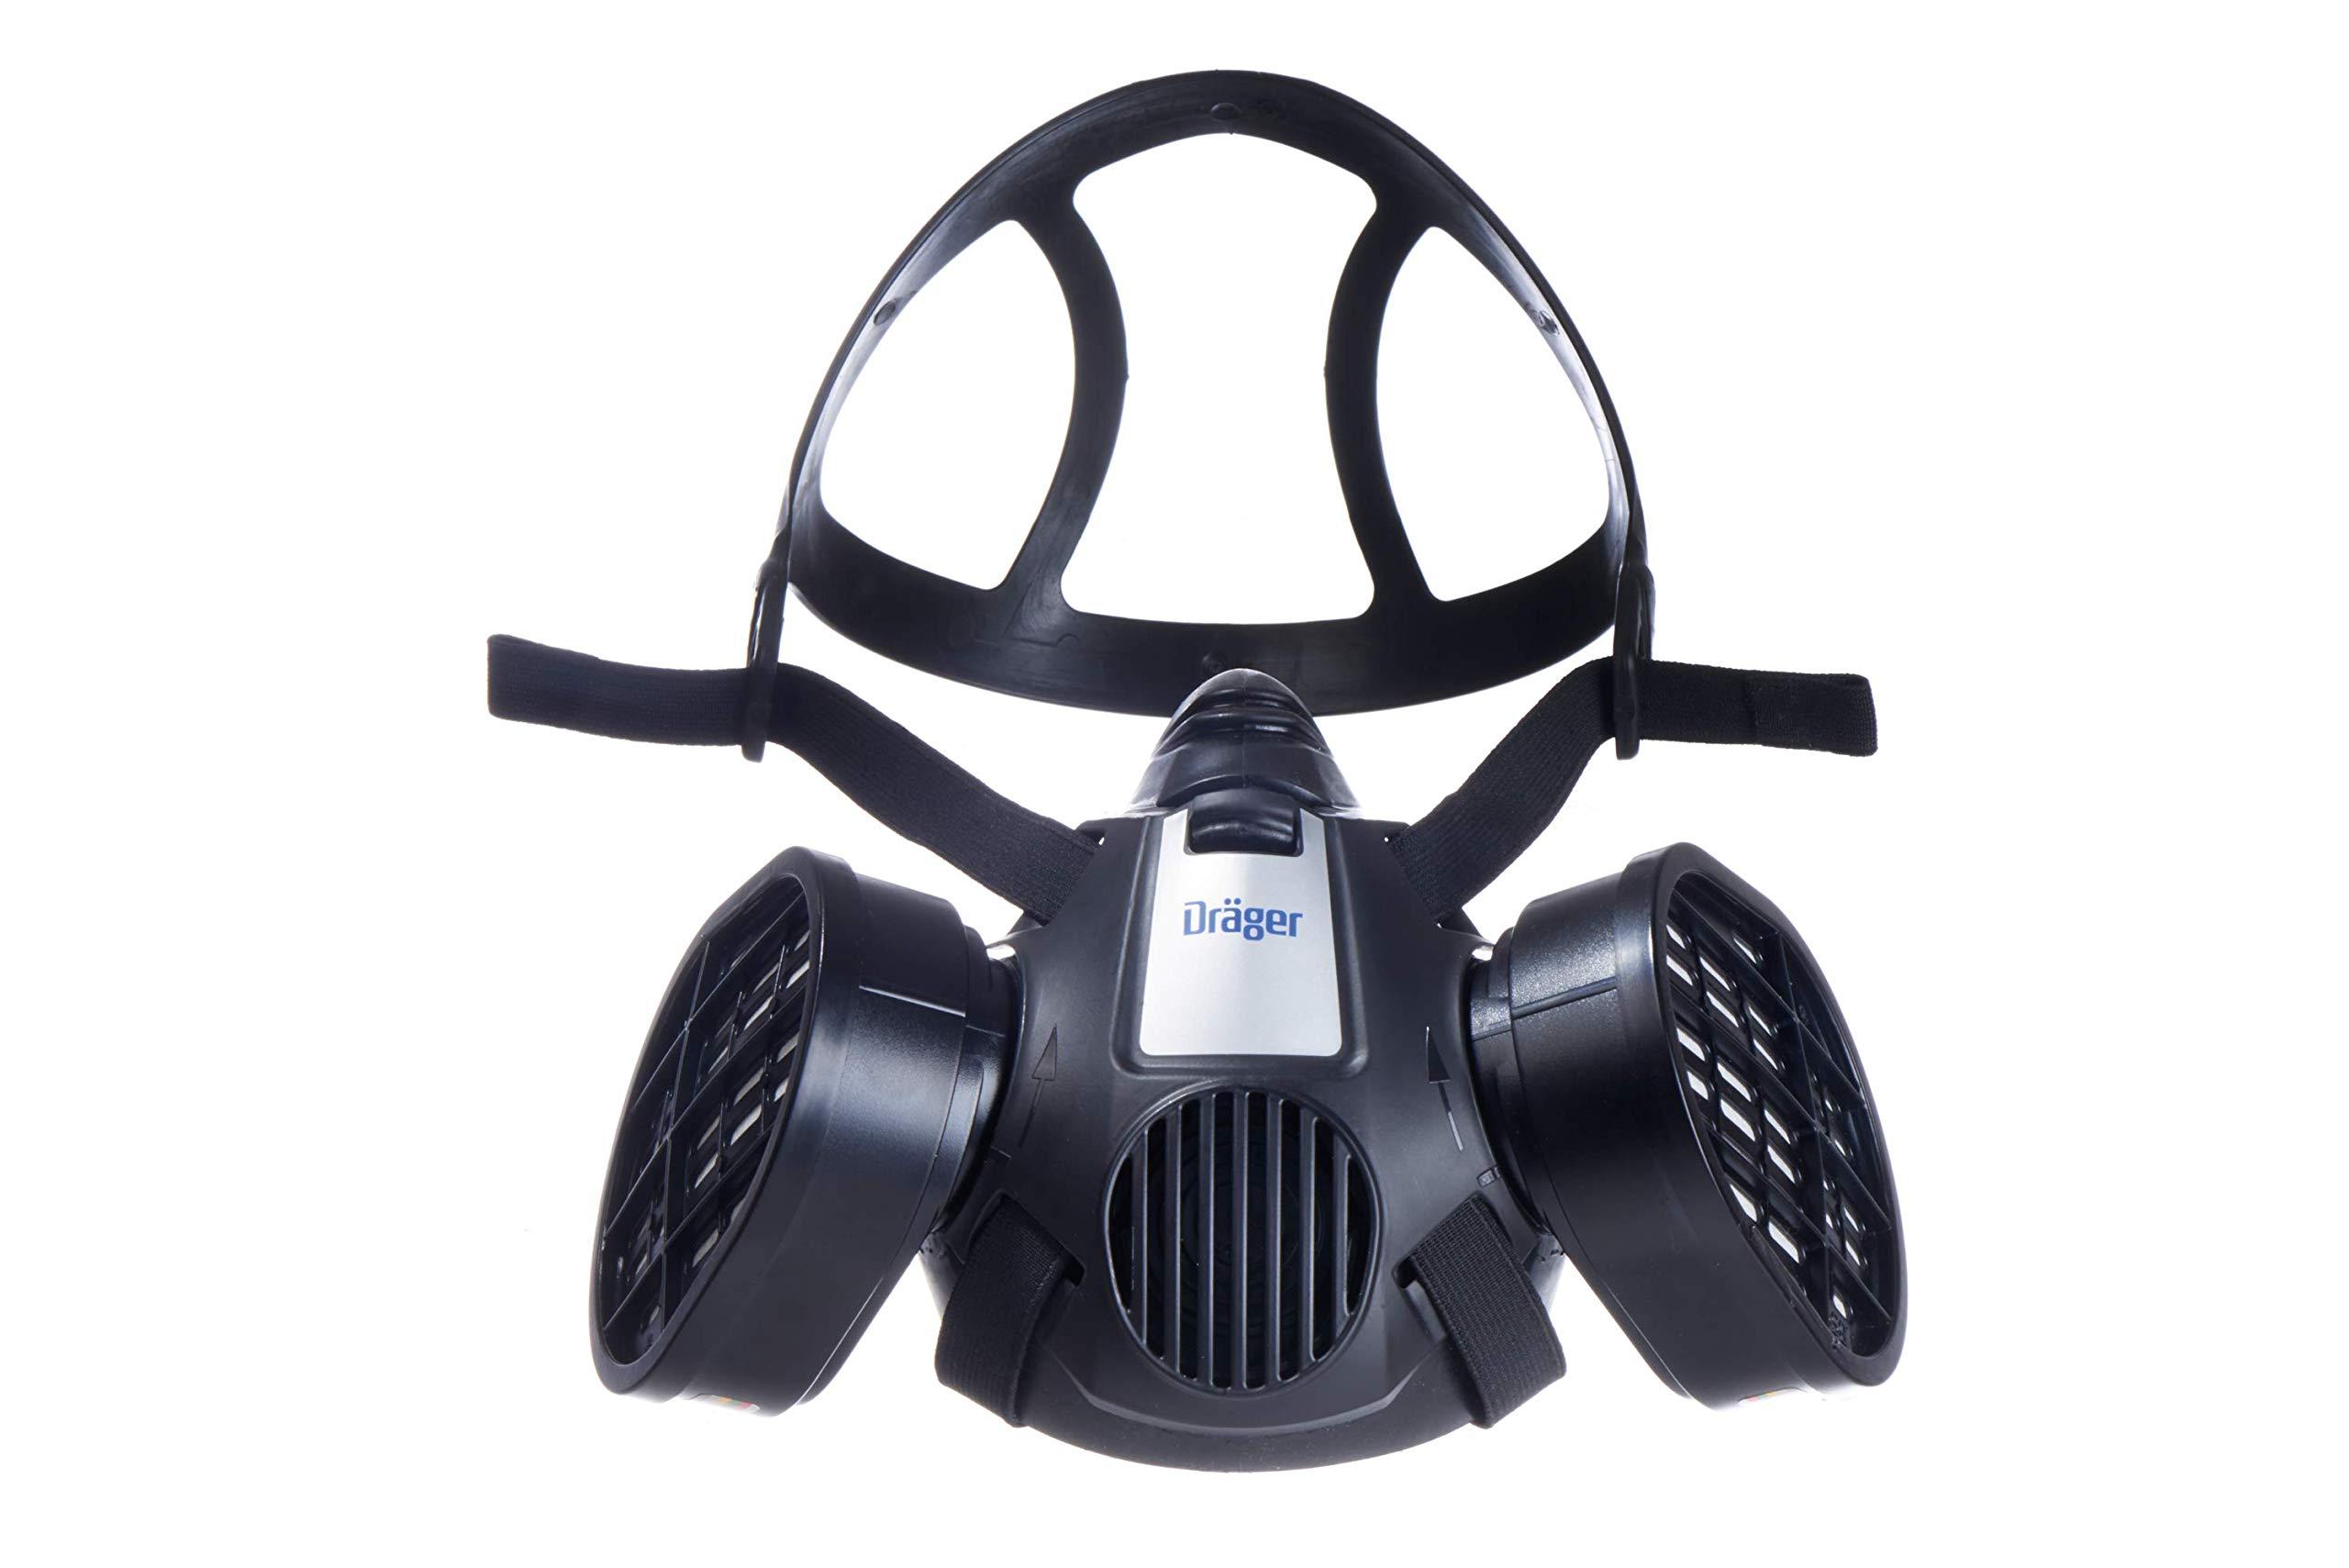 Dräger X-plore 3500 Half-Face Respirator Mask + 2x Multi-Gas Cartridge (OV/AG/HF/FM/CD/AM/MA/HS), NIOSH-Certified, Reusable Professional Respiratory Protection Kit by Dräger